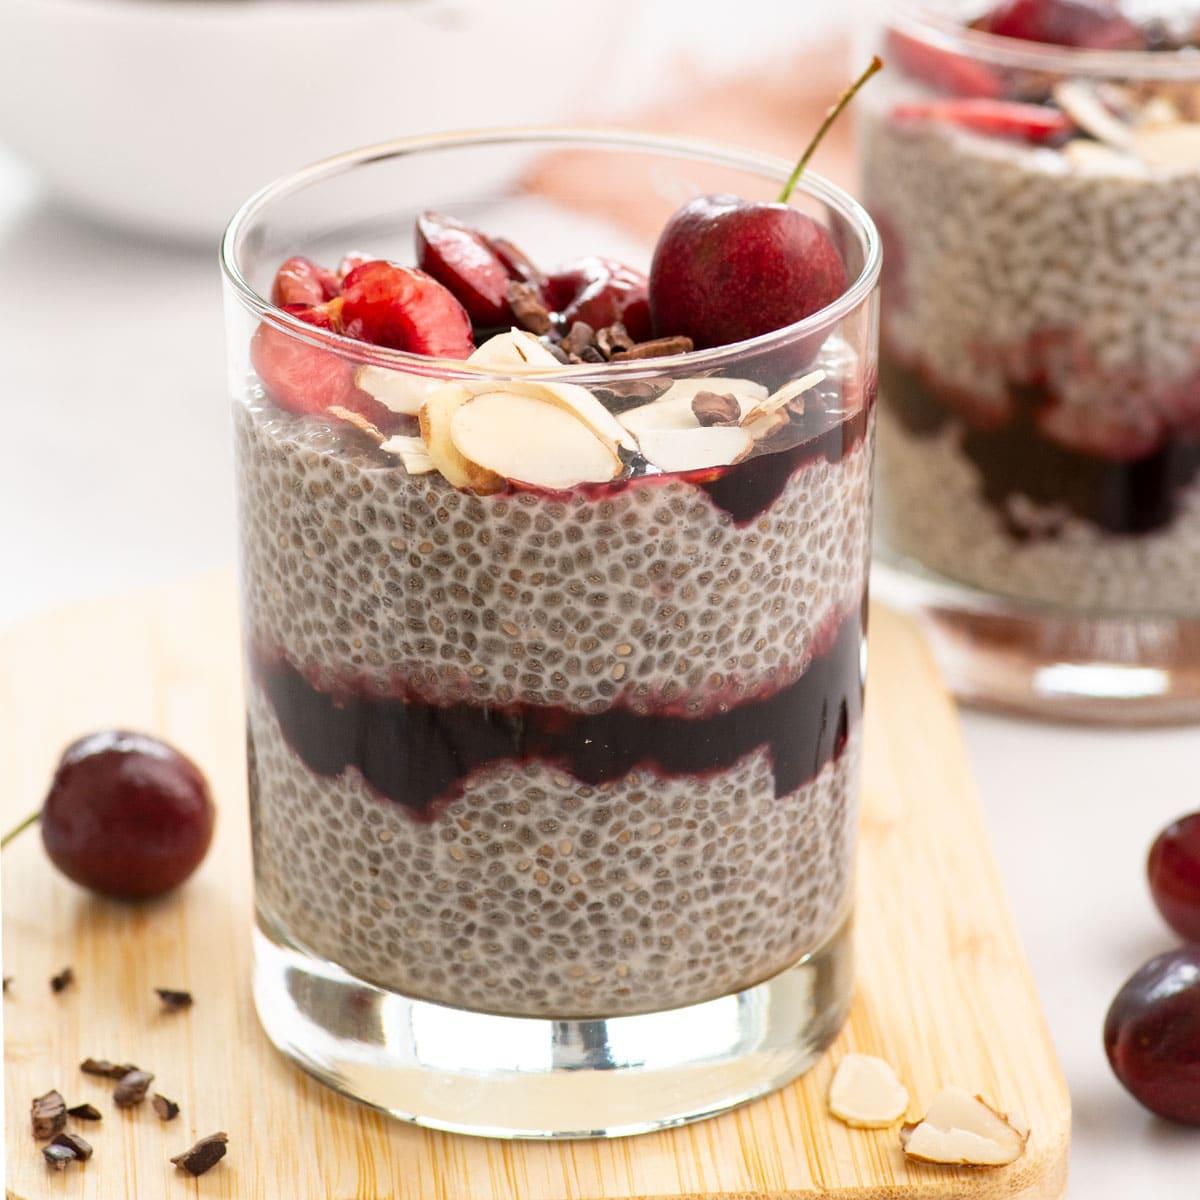 vegan chocolate cherry chia pudding parfaits with chocolate chips